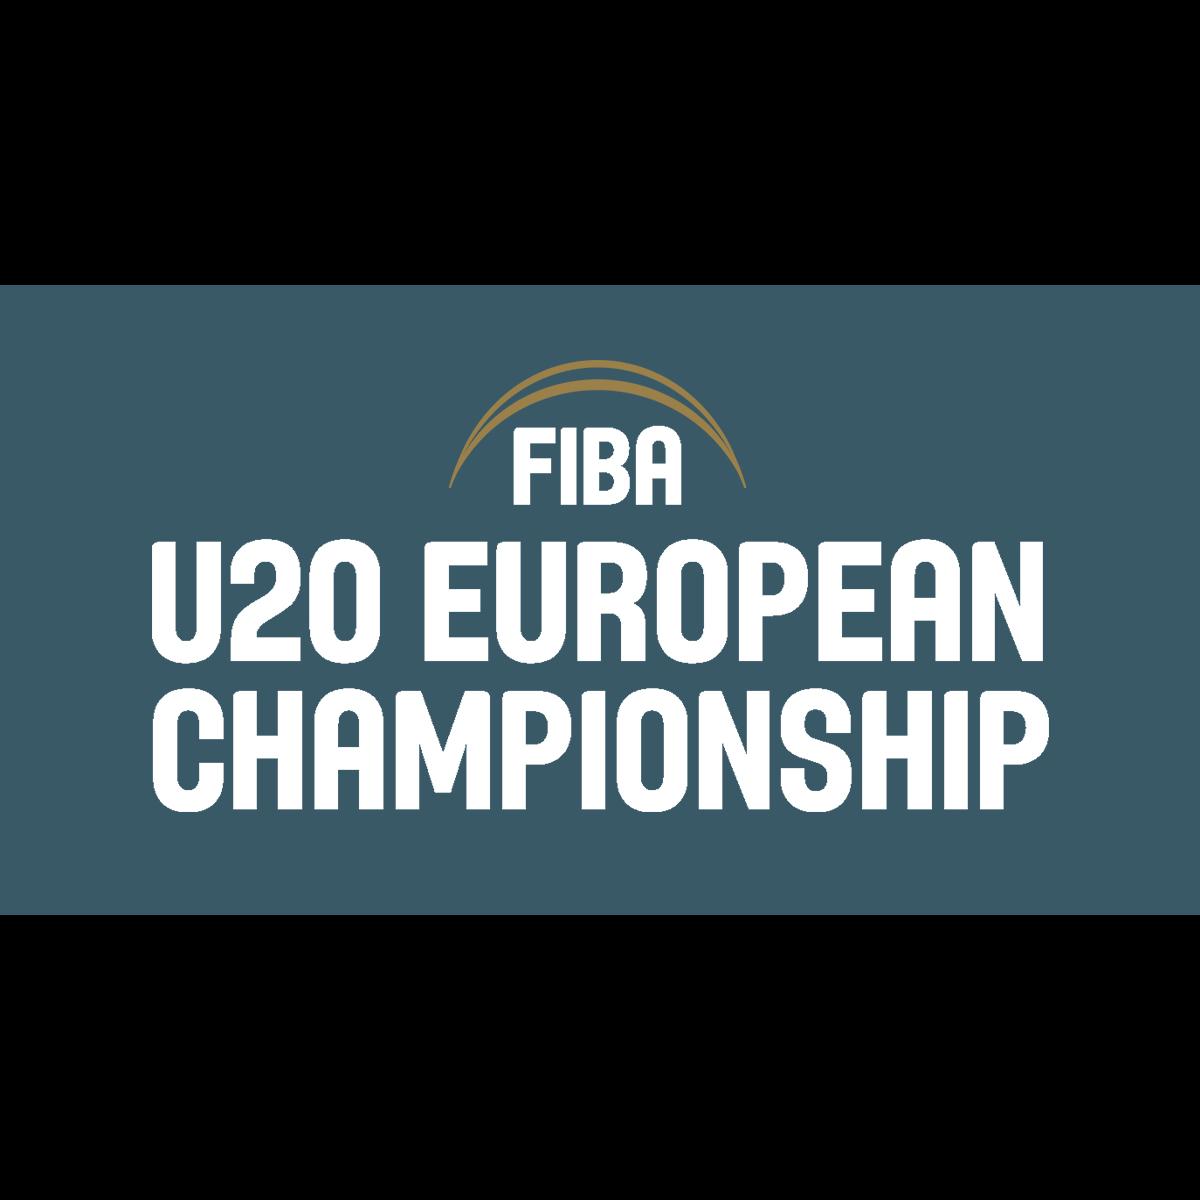 2019 FIBA U20 European Basketball Championship - Division B